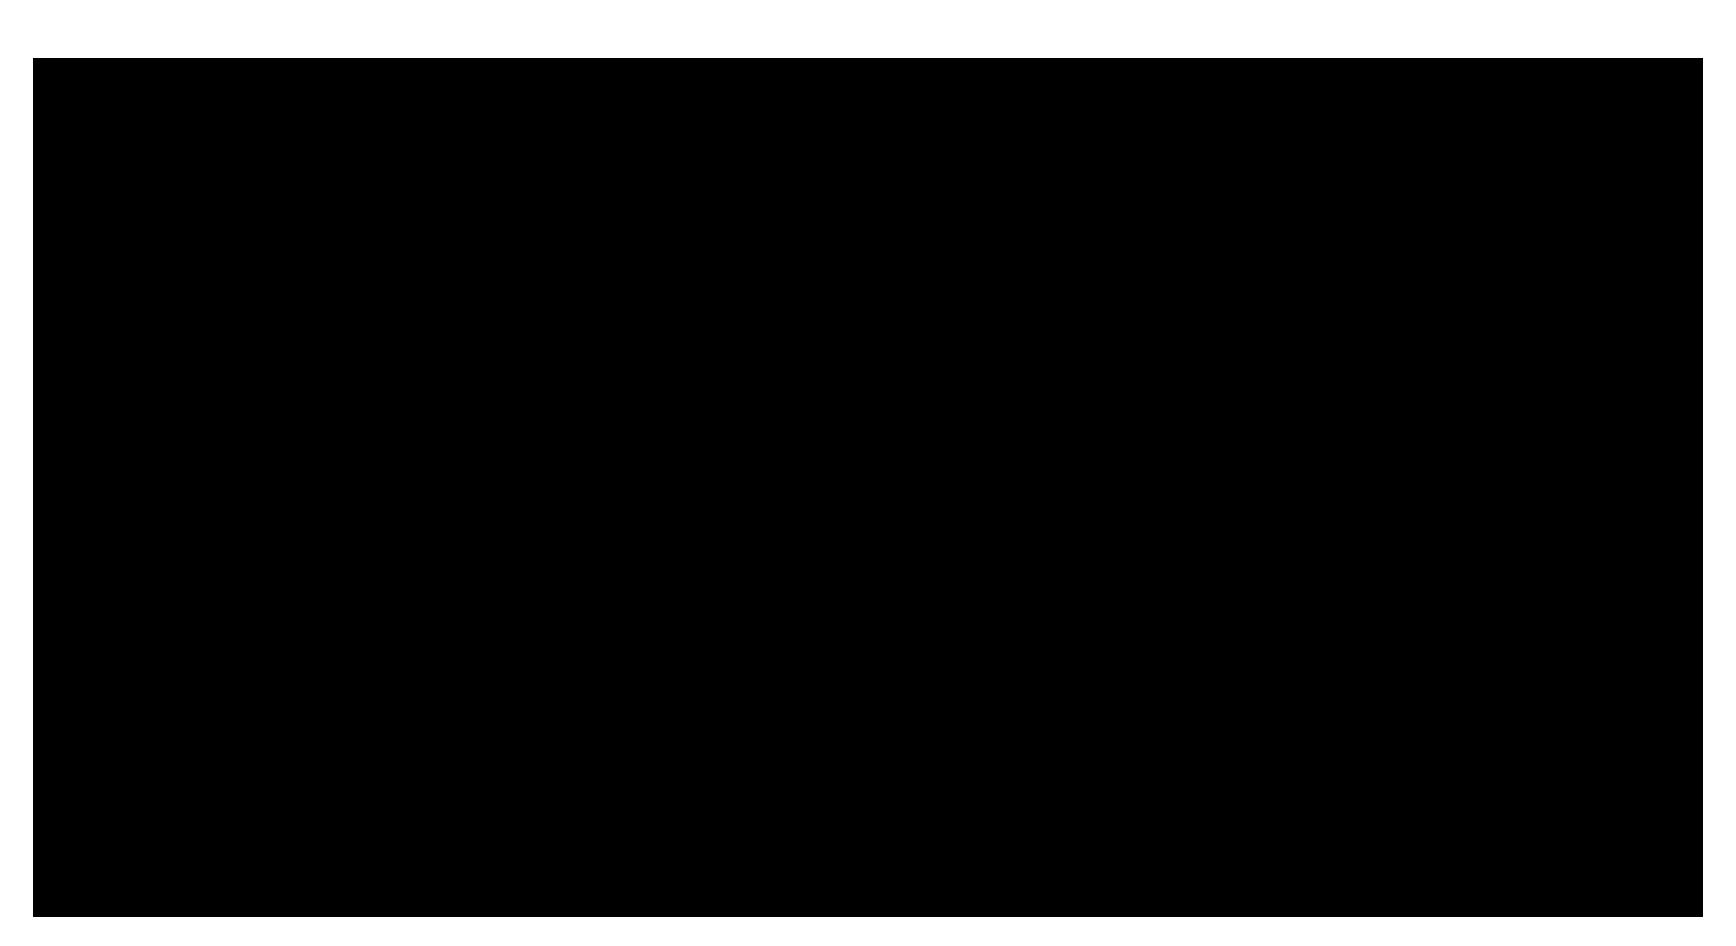 luxury-london-media-logo2.png